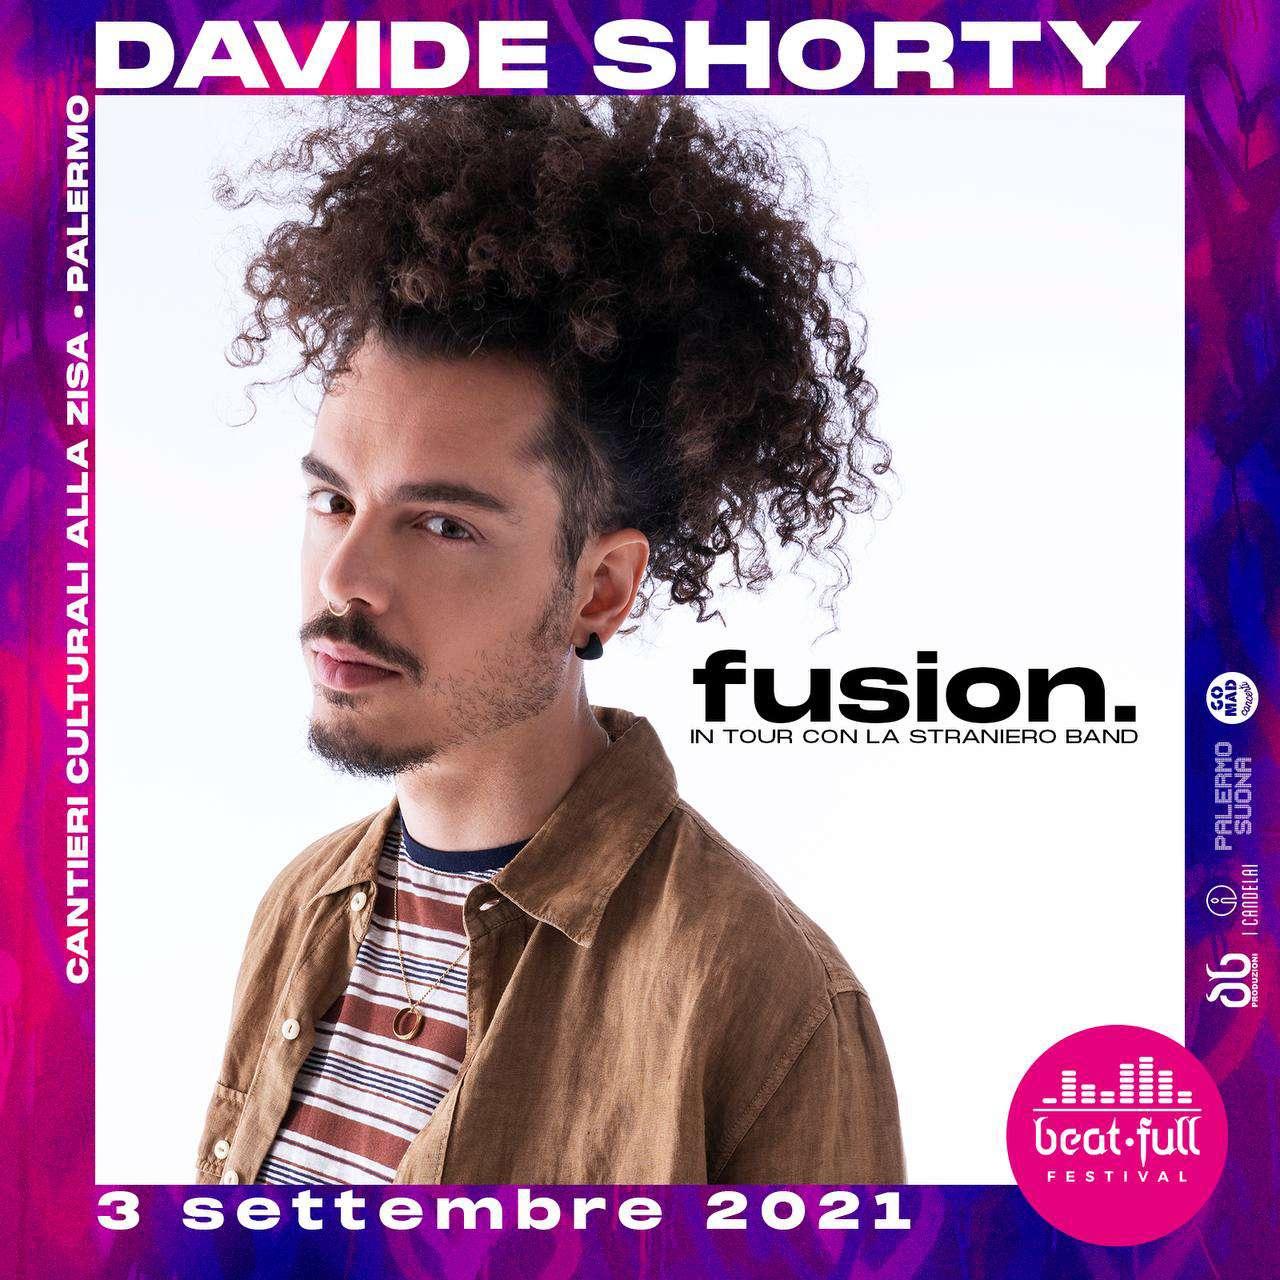 BEAT FULL FESTIVAL 2021 - Davide Shorty + Nicolò Carnesi Cantieri Culturali alla Zisa / PA